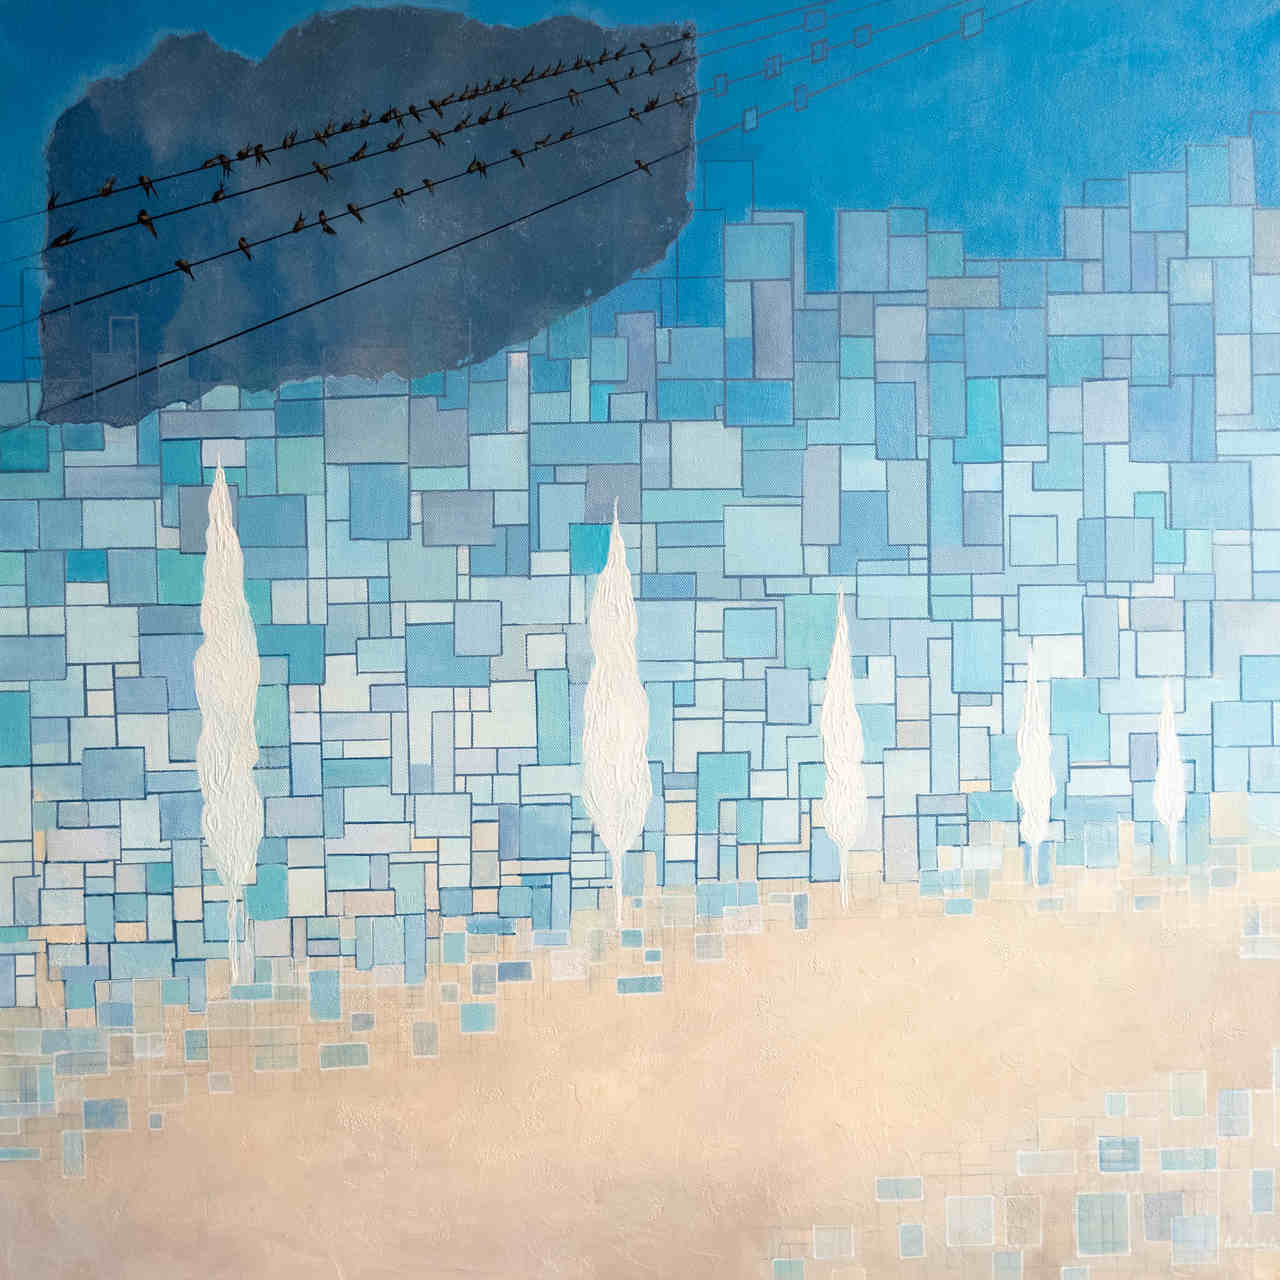 Joanna-Adamek-TAKI-PEJZAŻ-akryl-80x80